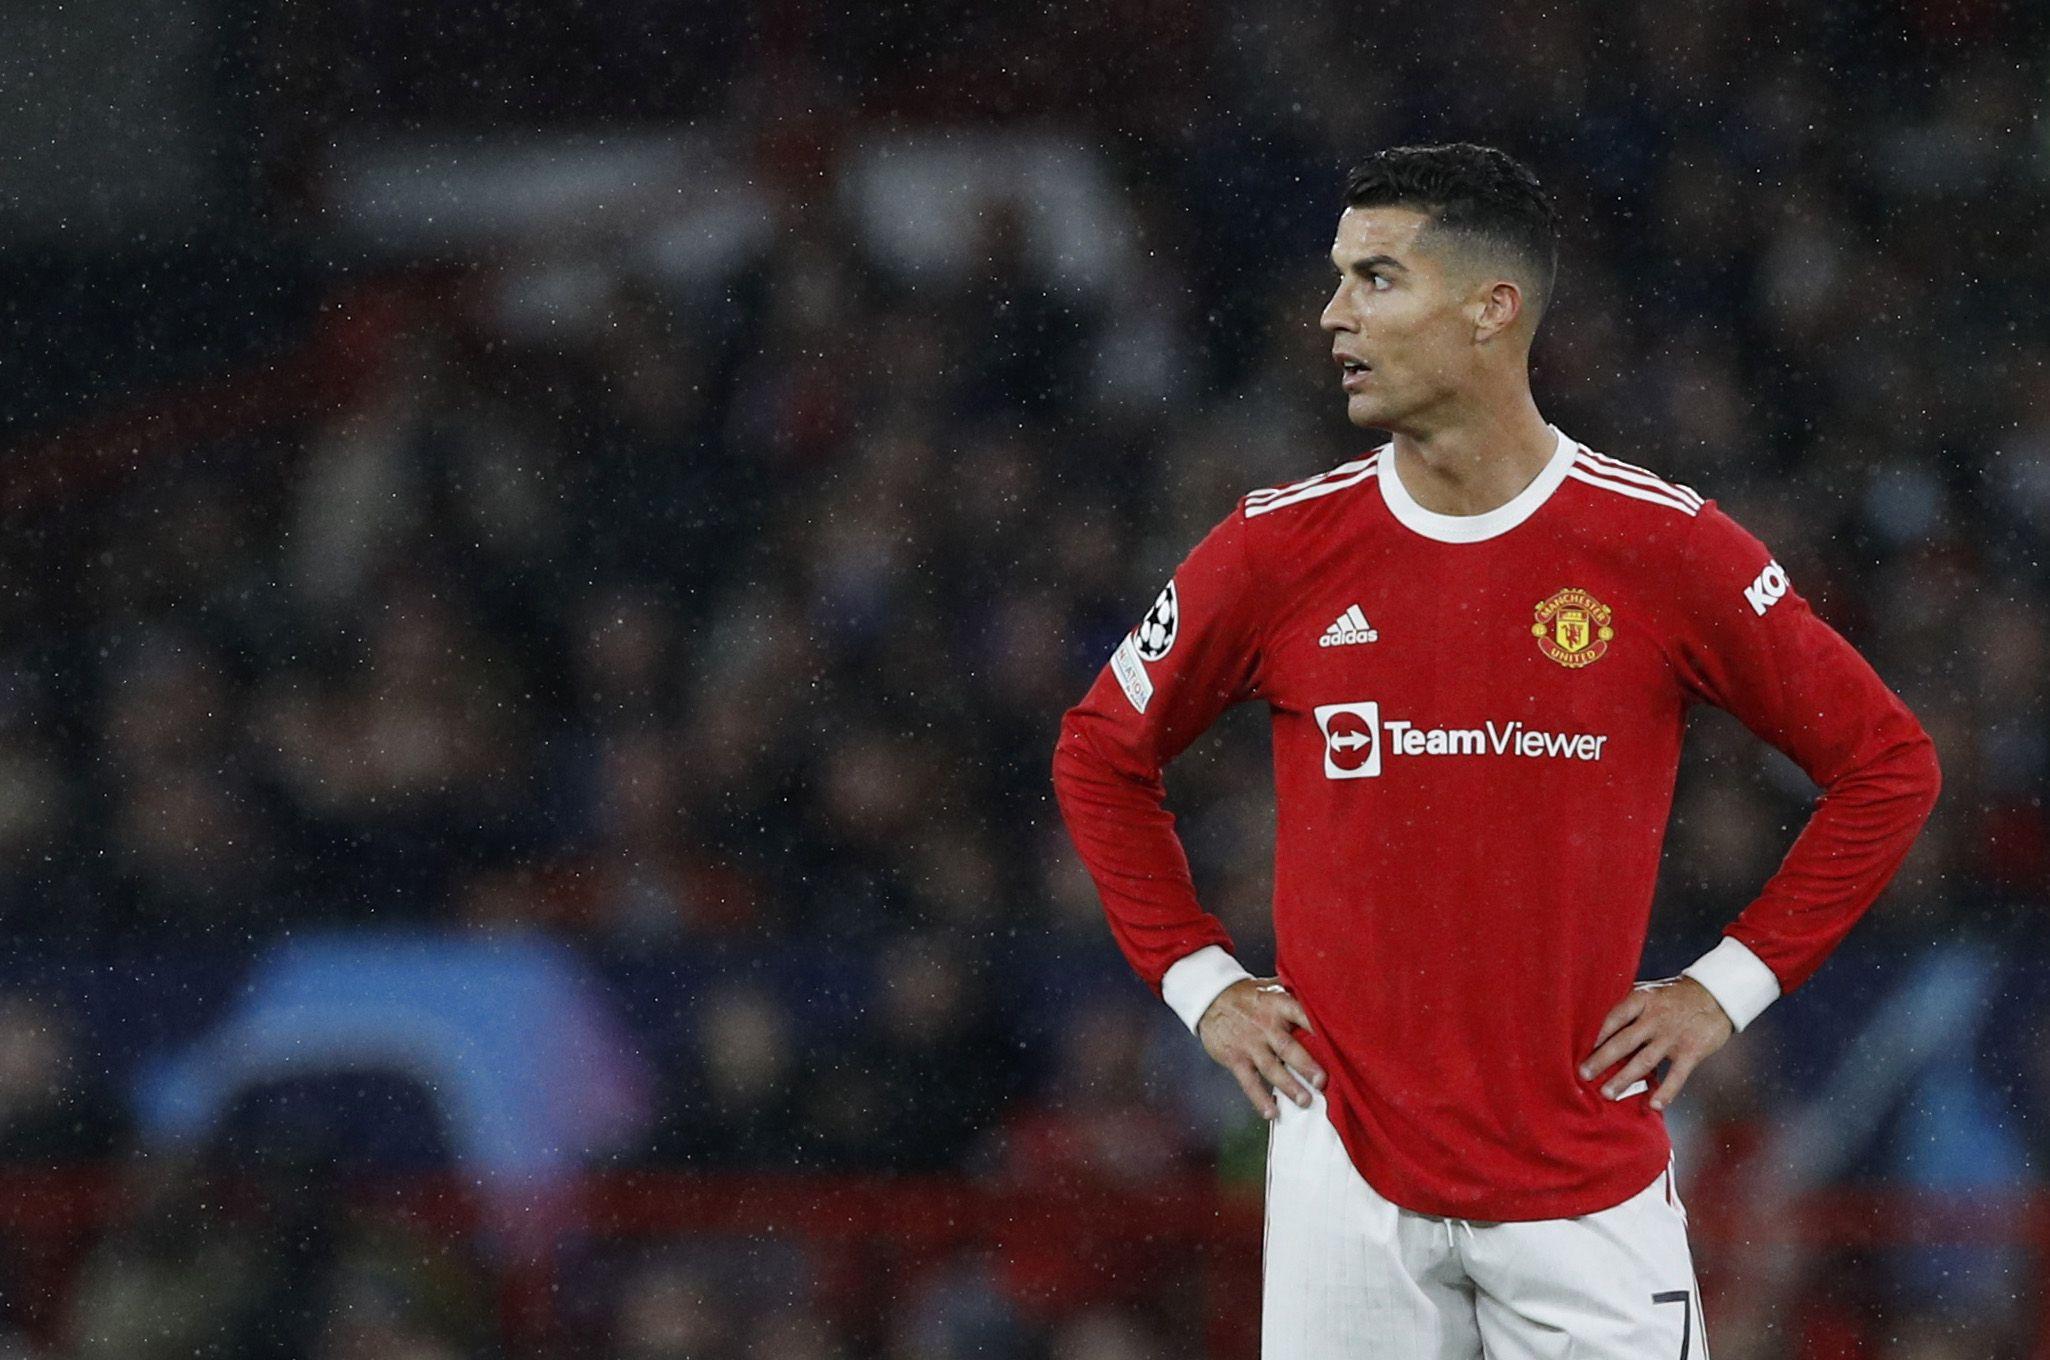 Cristiano Ronaldo volvió al Manchester United después de más de una década (REUTERS/Phil Noble)